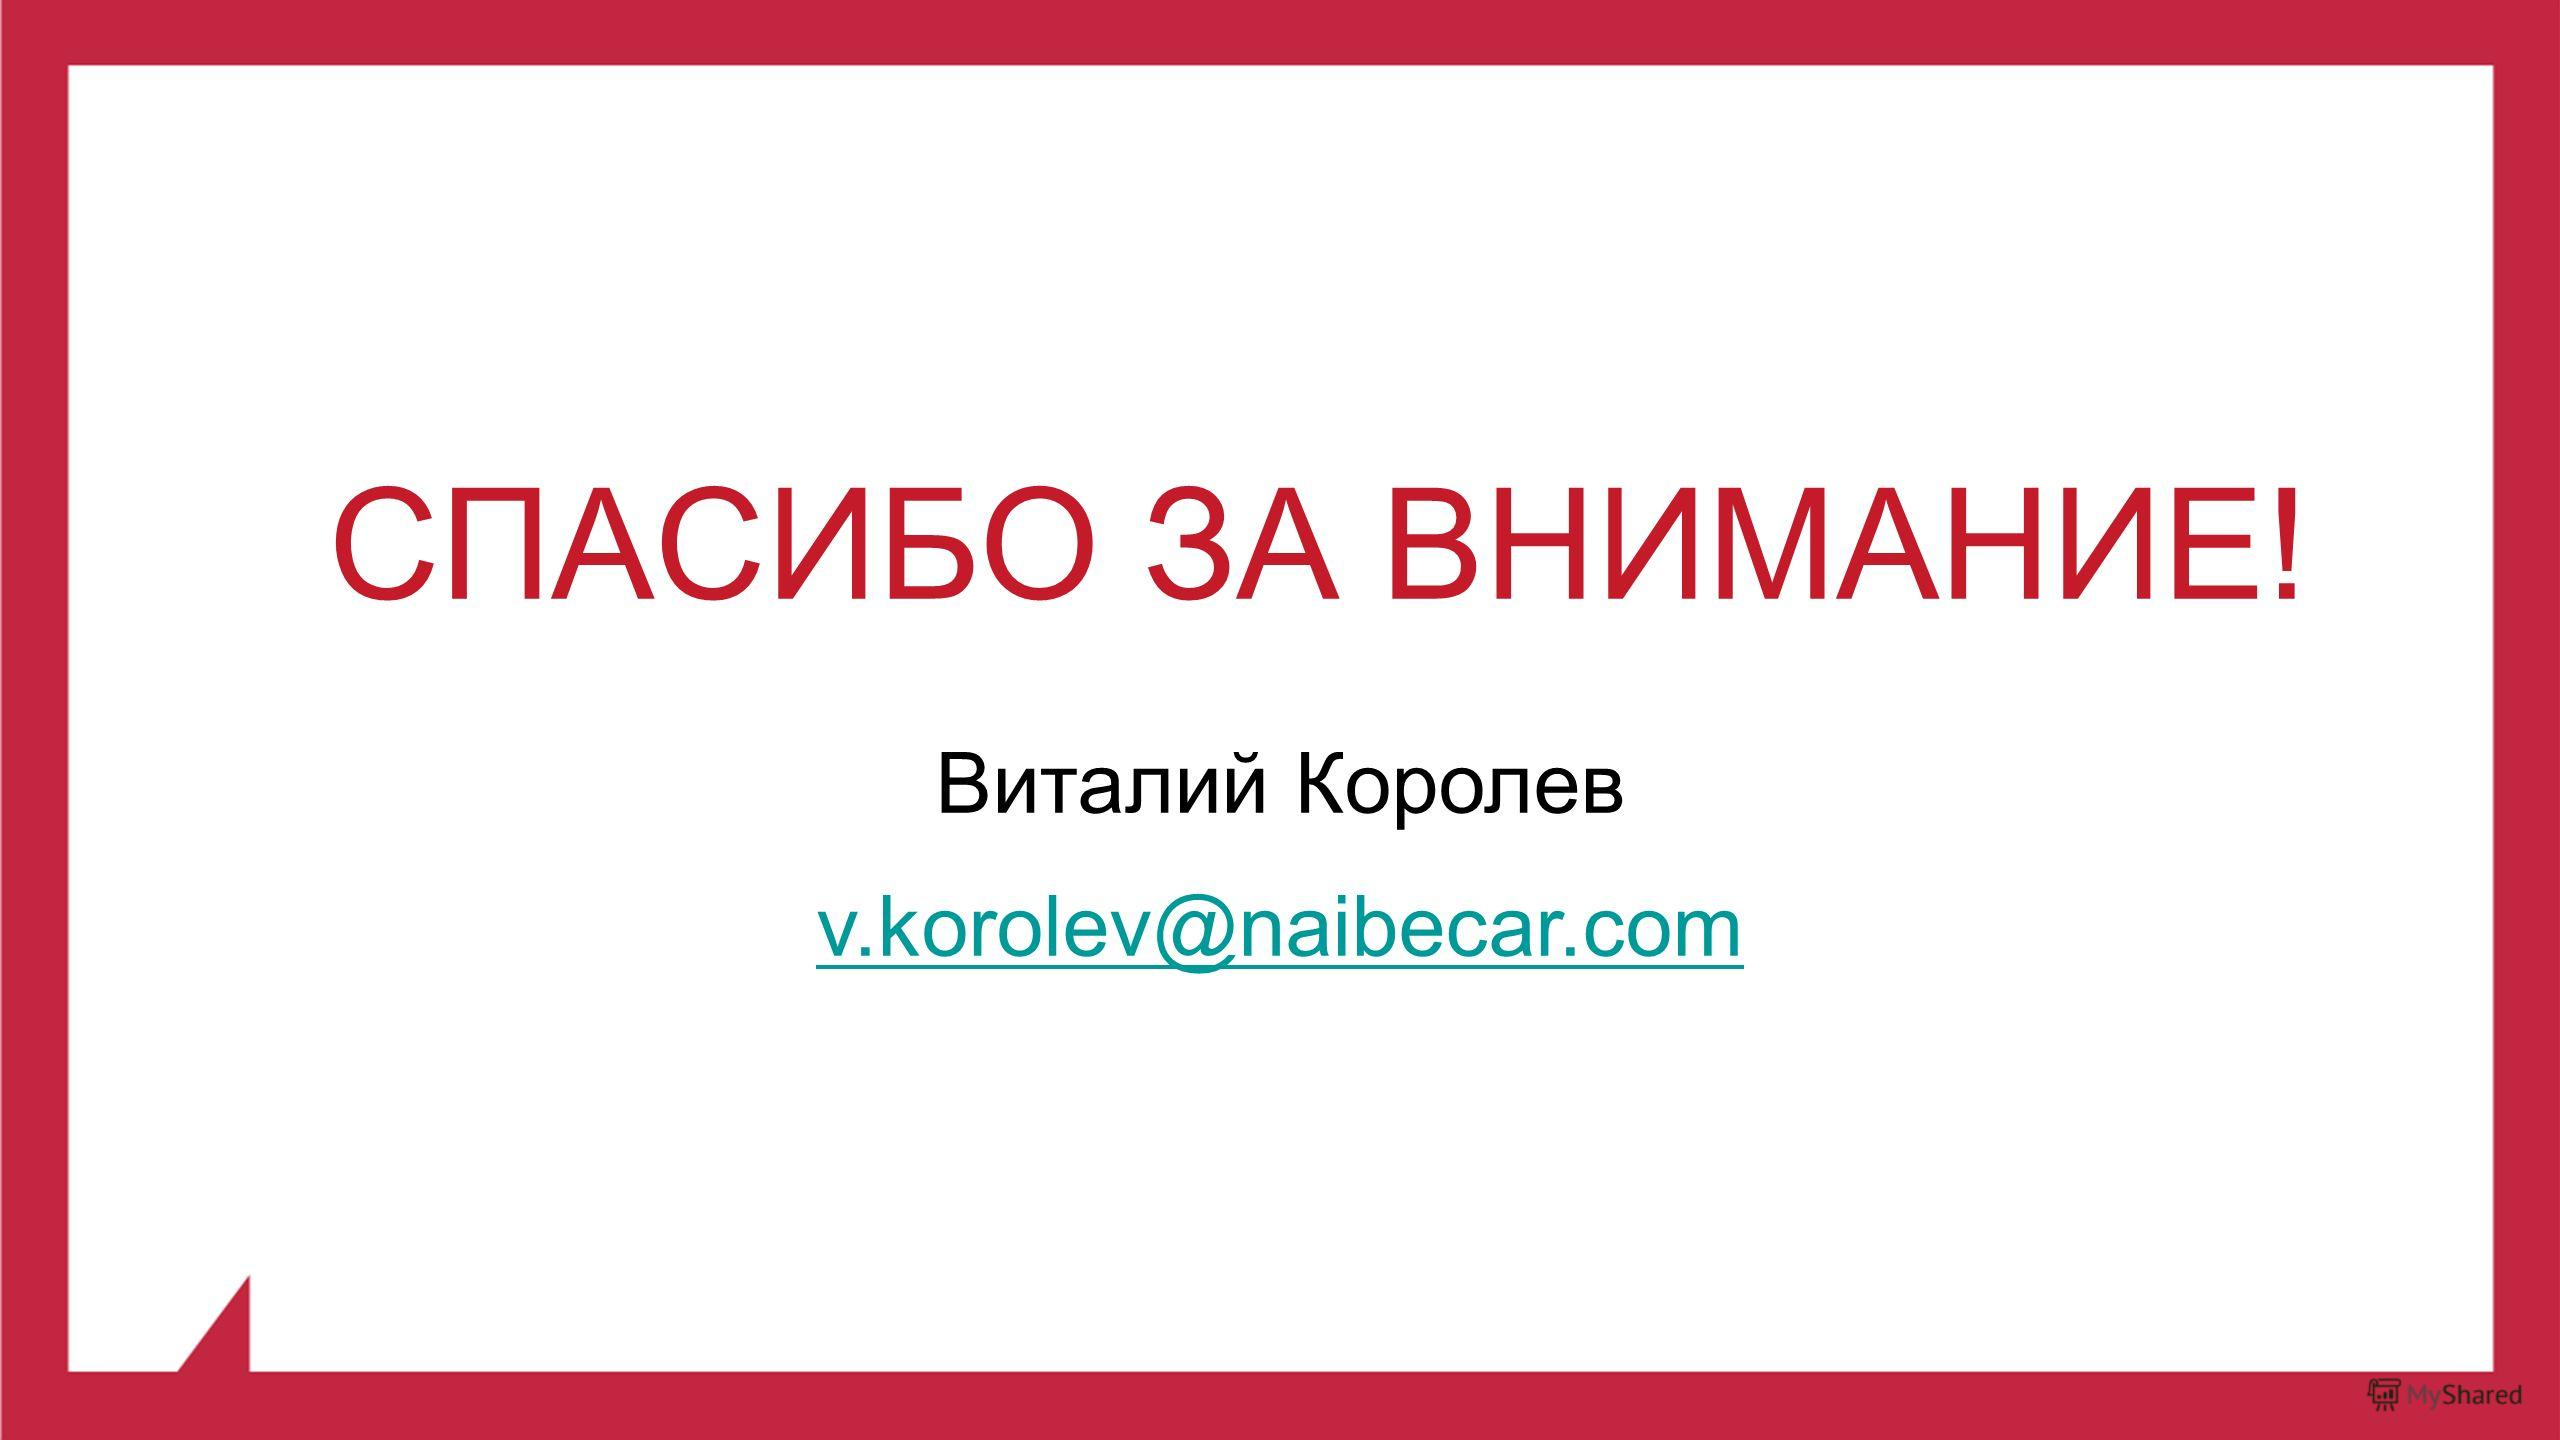 СПАСИБО ЗА ВНИМАНИЕ! Виталий Королев v.korolev@naibecar.com